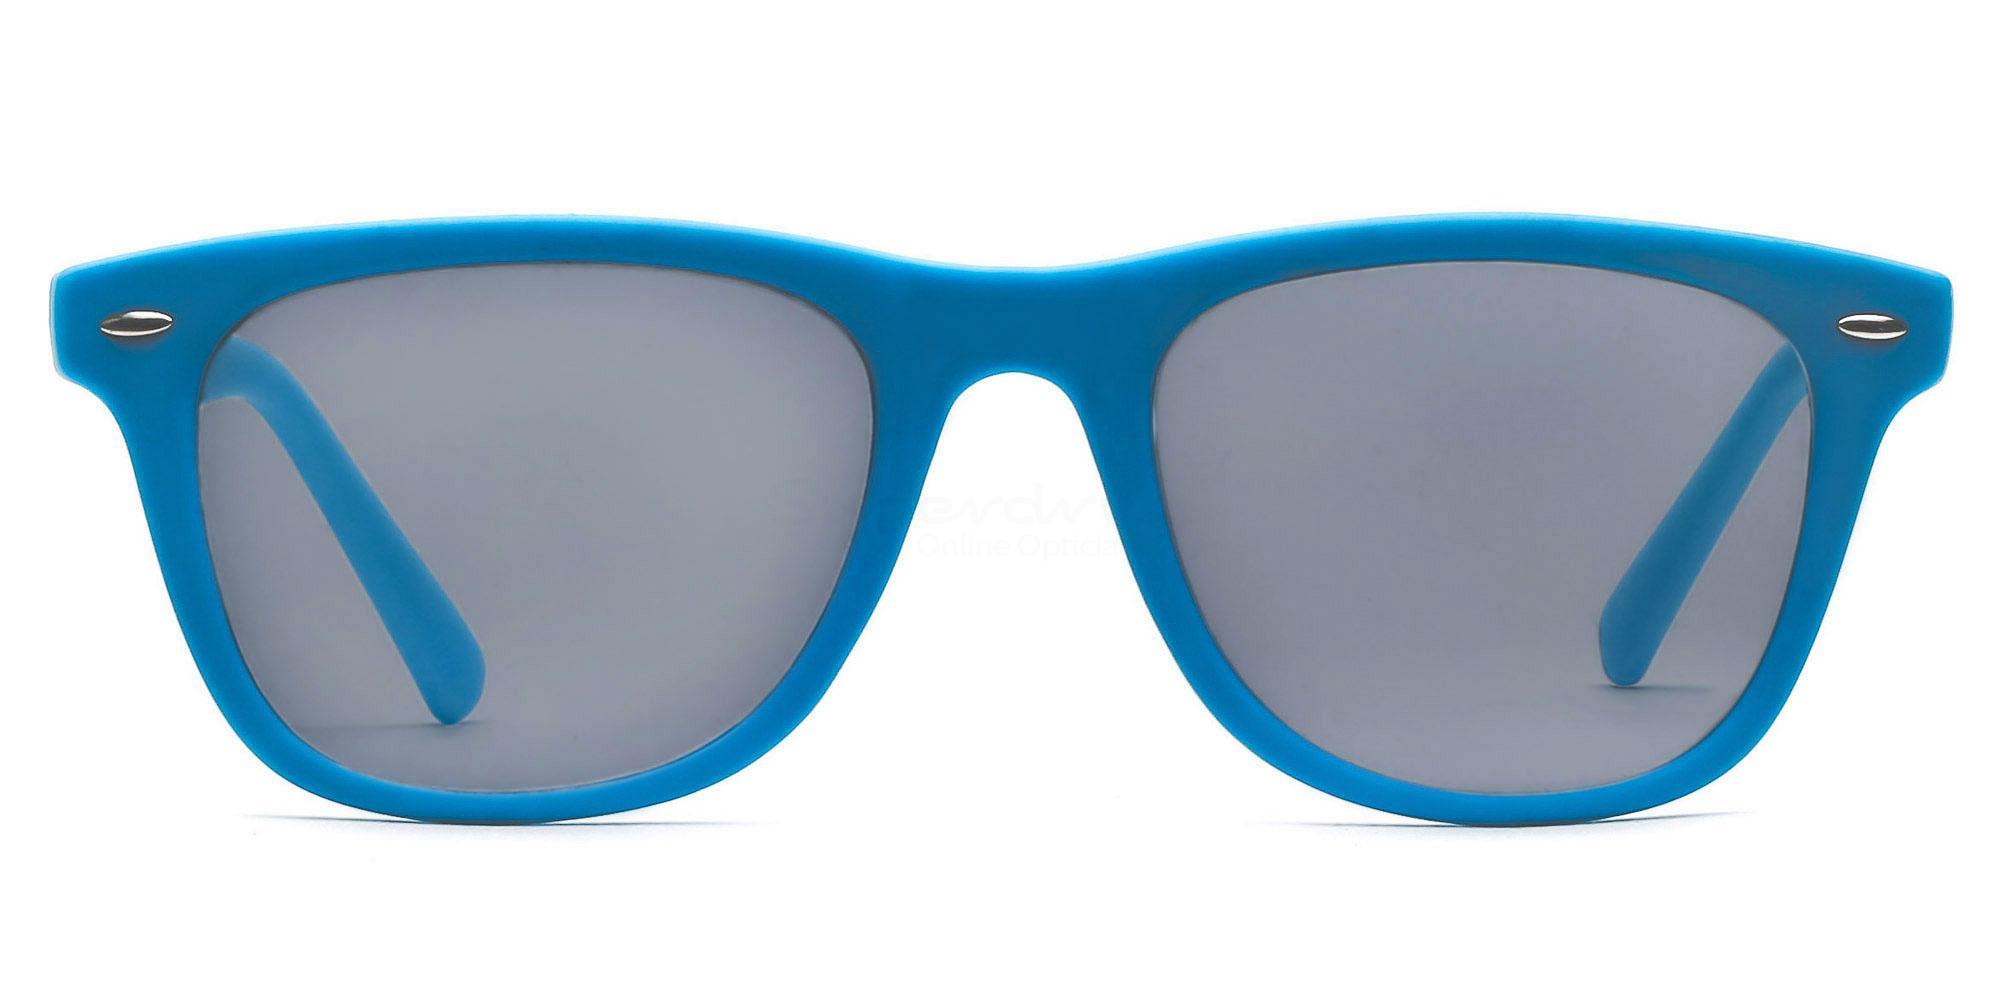 C5 8121 - Light Blue (Sunglasses) Sunglasses, Helium